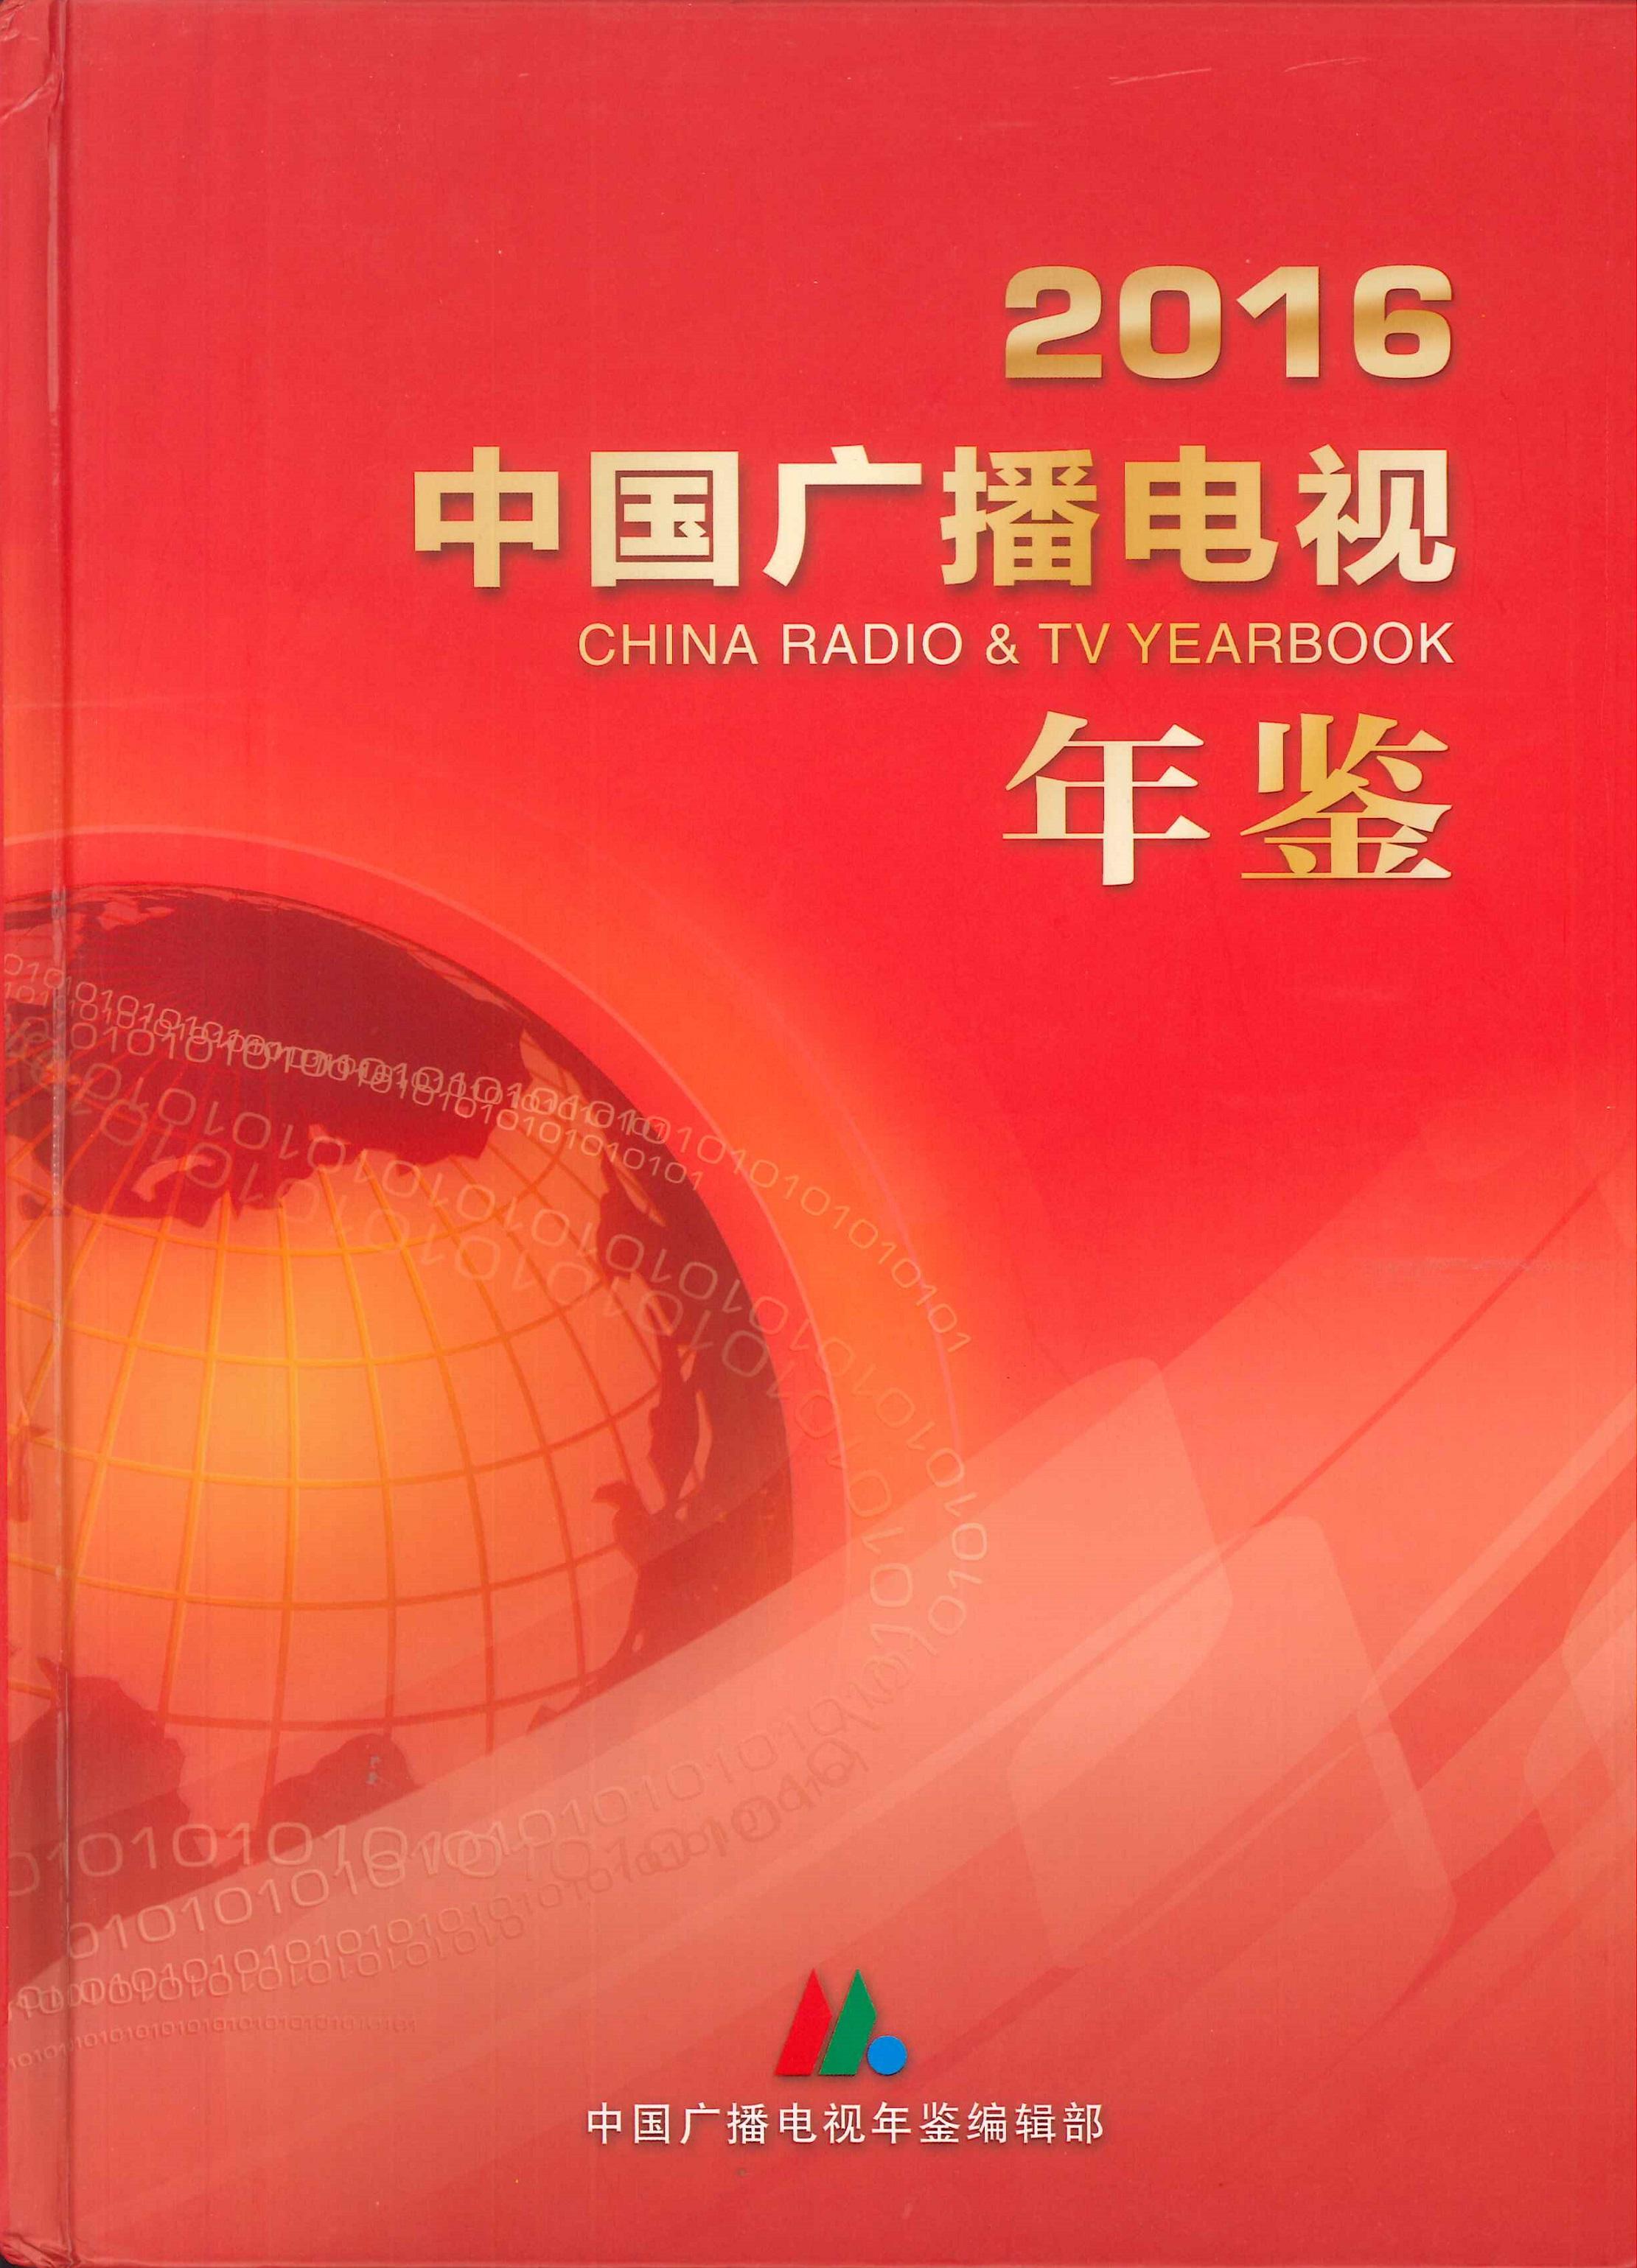 中国广播电视年鉴=China radio & TV yearbook